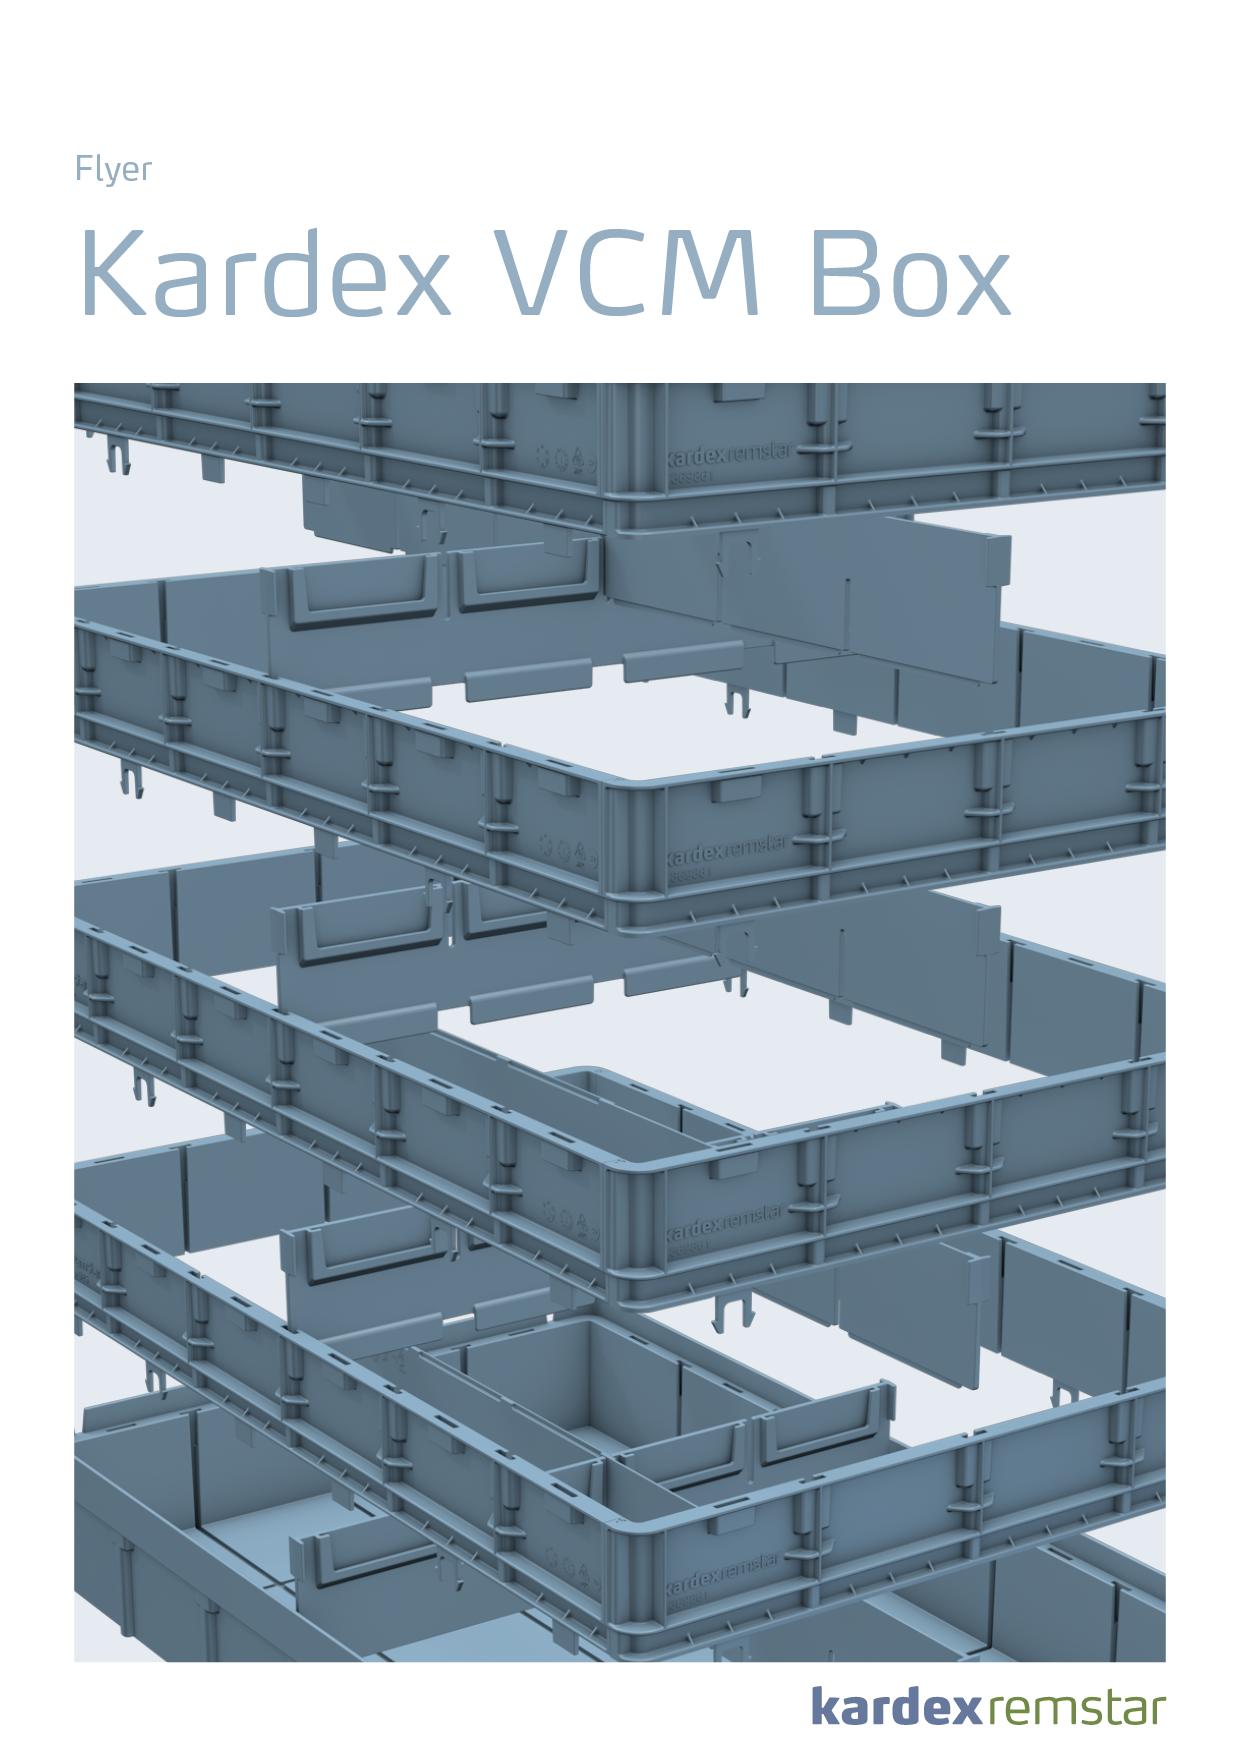 Flyer_EN_VCMBox